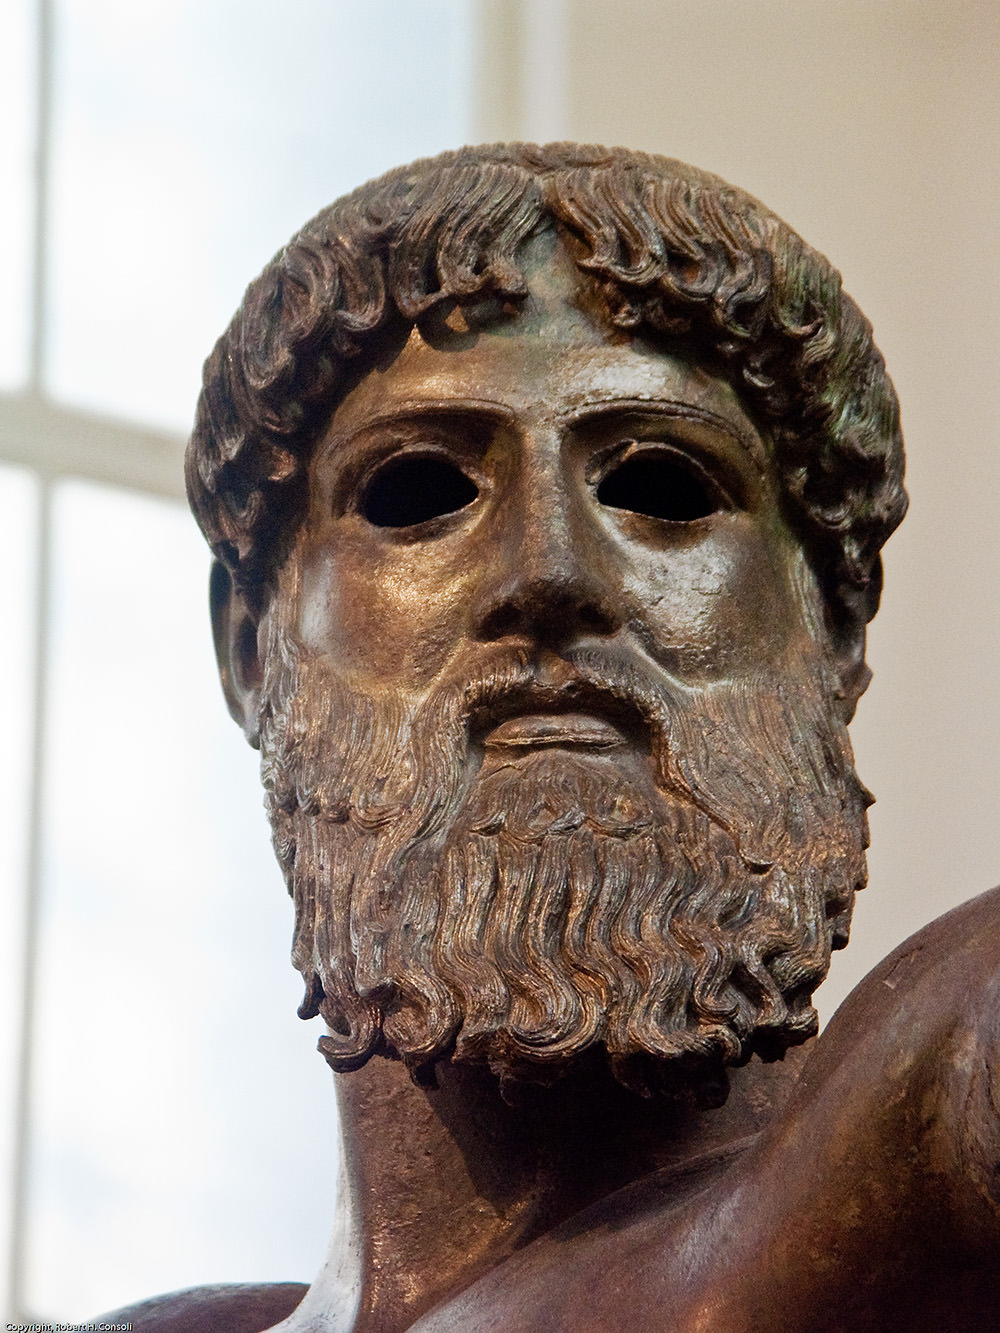 zeus ancient history encyclopedia